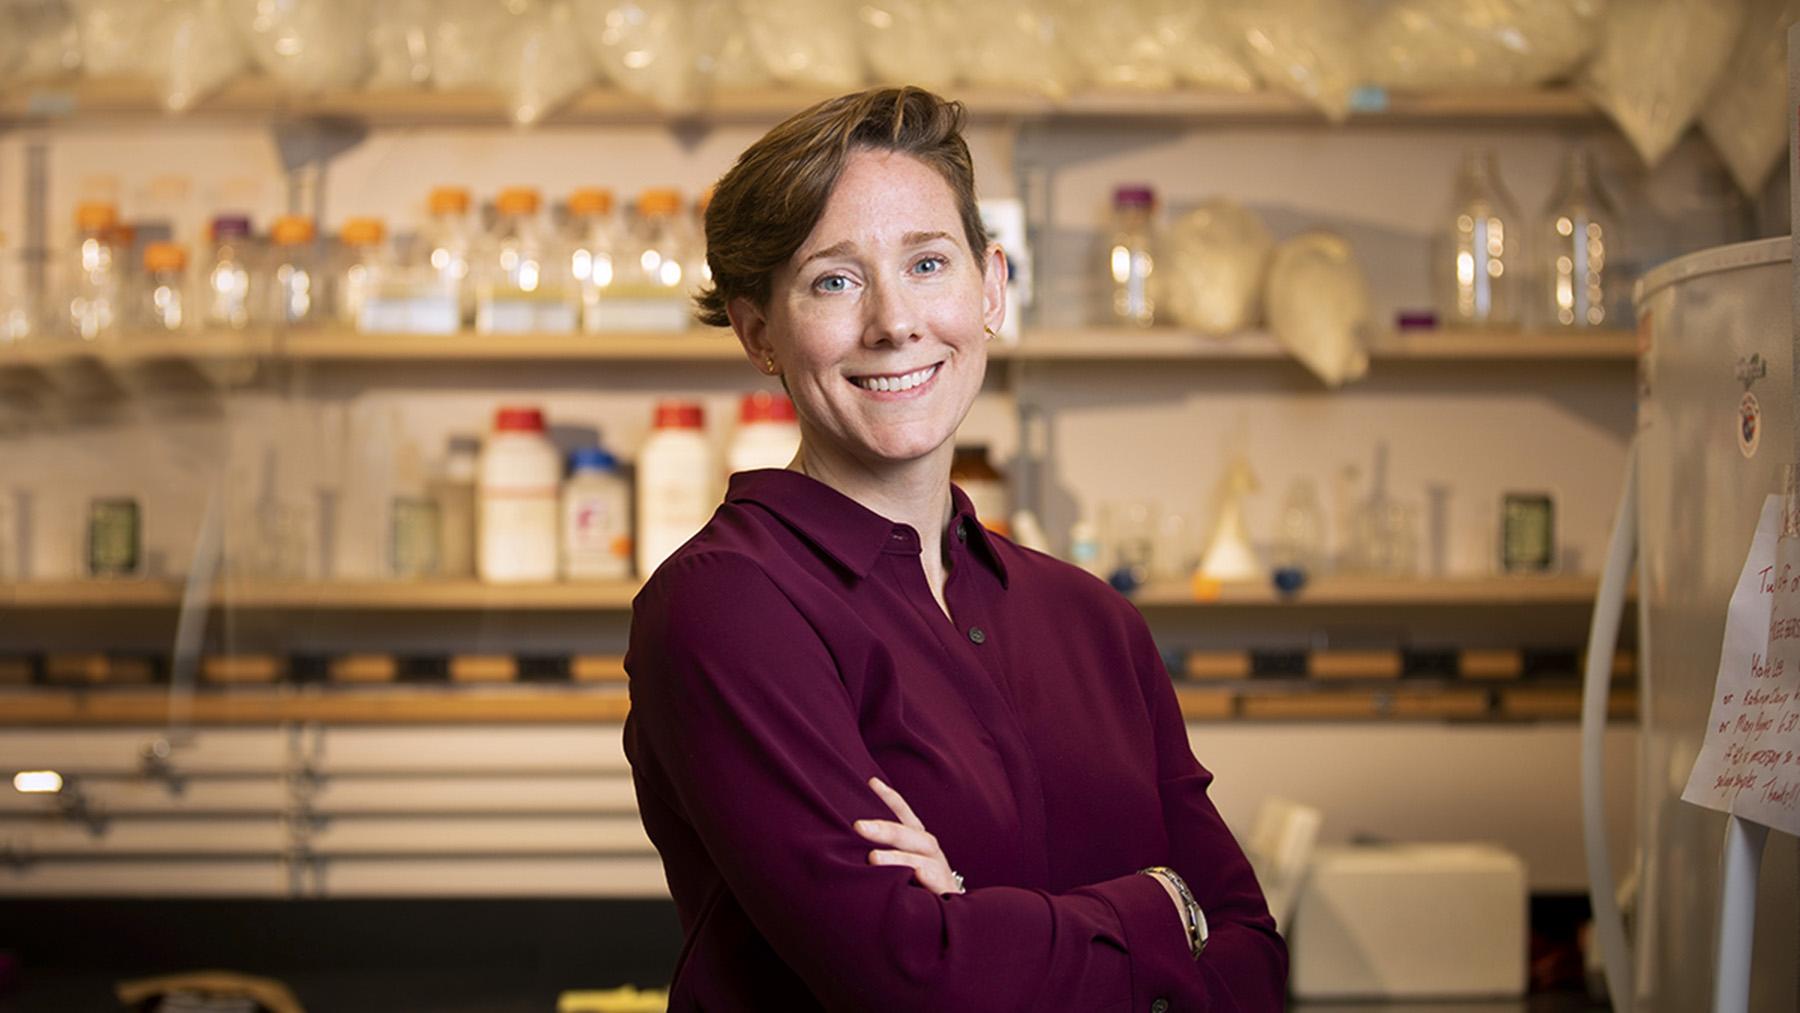 Professor Kate Clancy. Photo by L.B. Stauffer